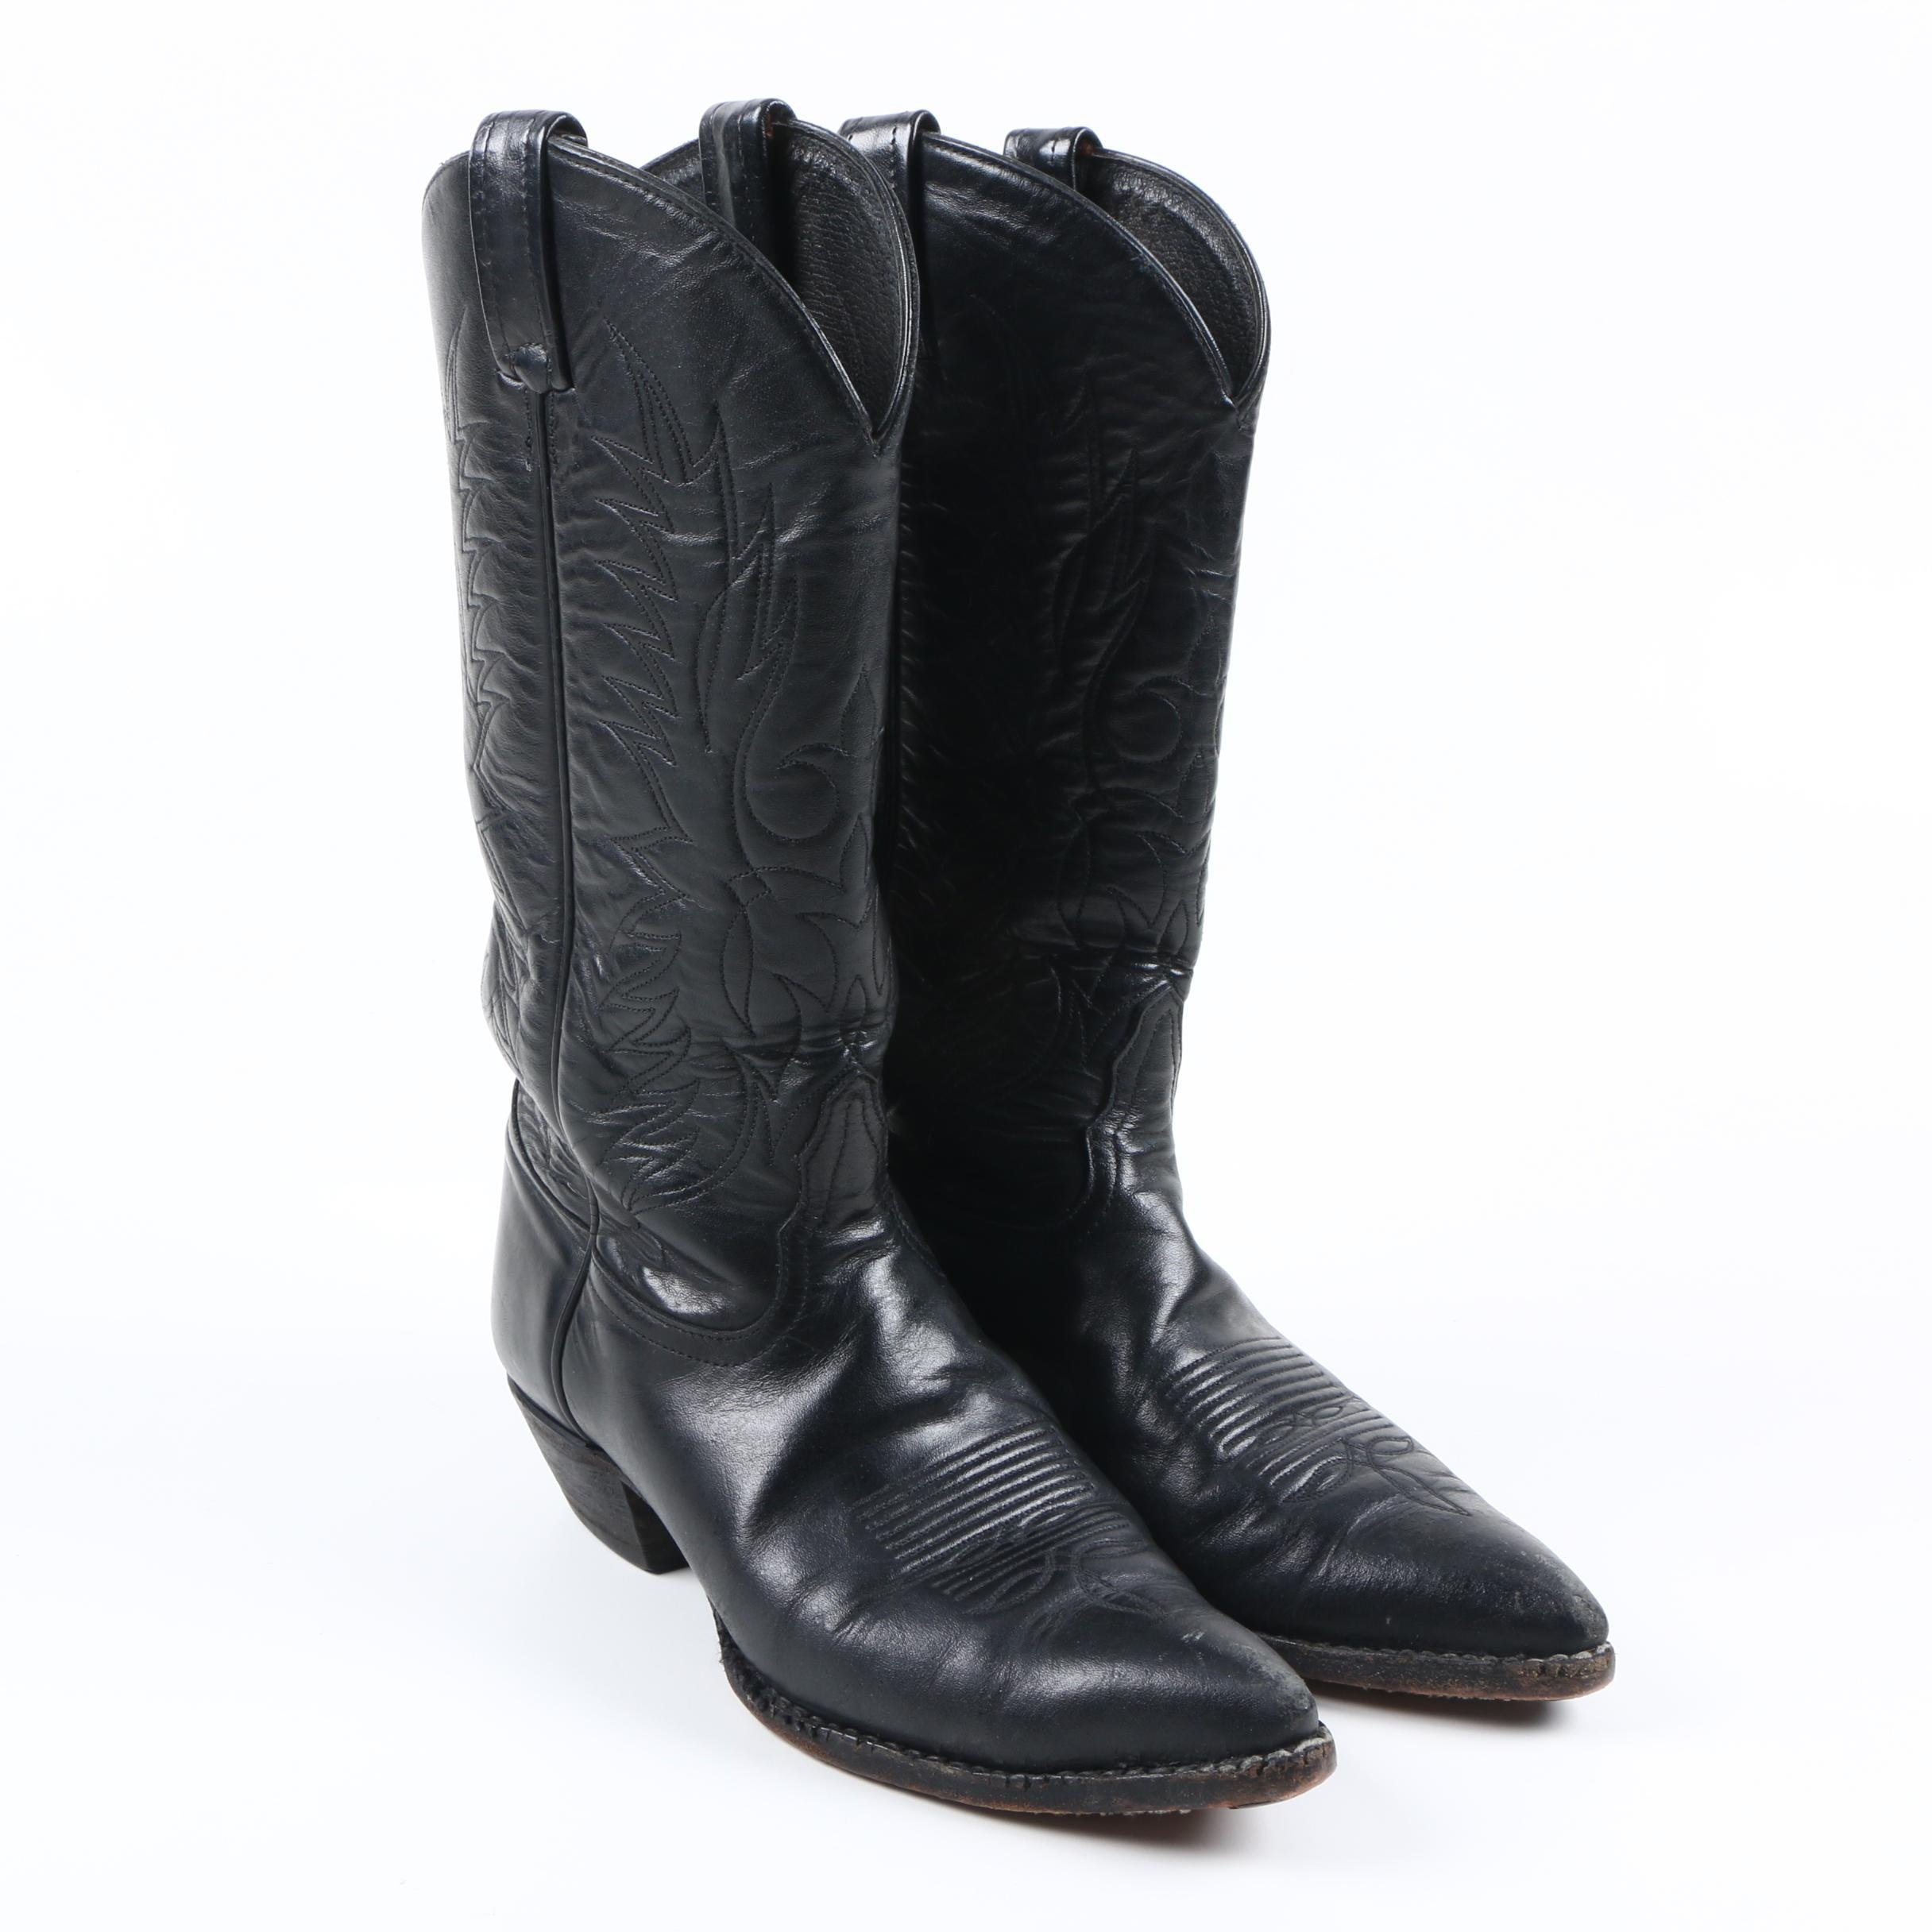 Women's Tony Lama Black Leather Boots